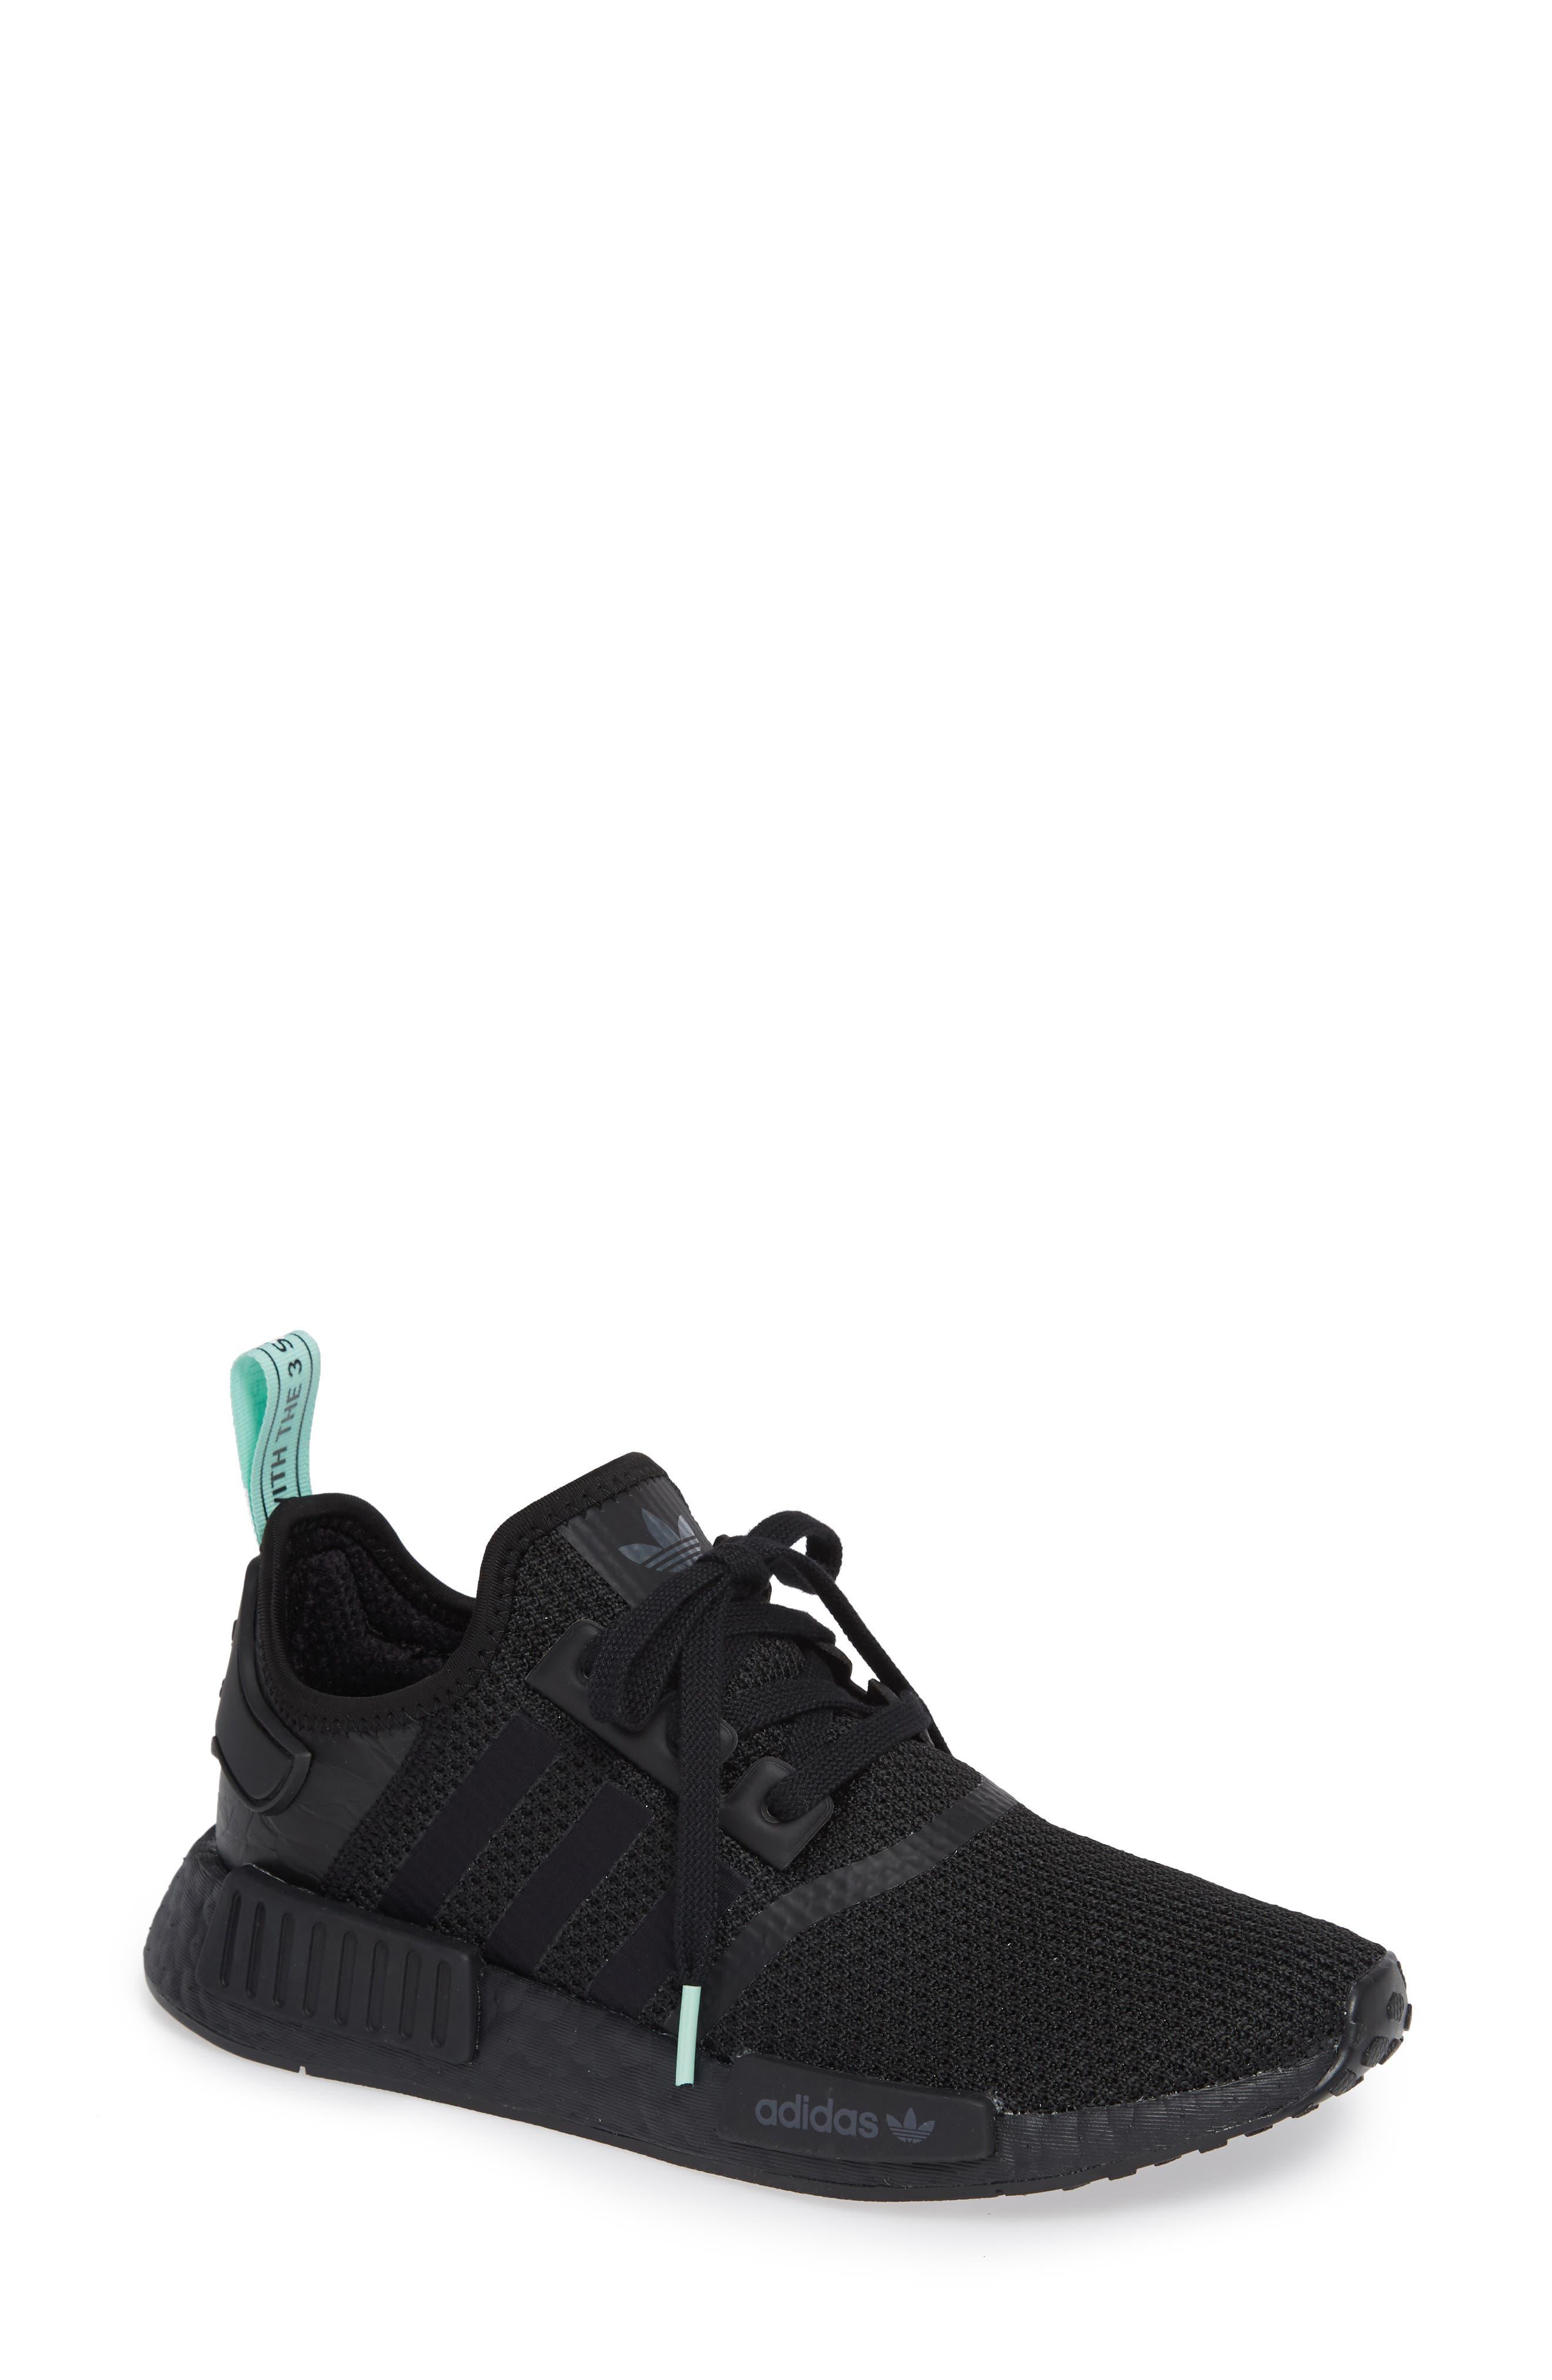 NMD R1 Athletic Shoe,                             Main thumbnail 1, color,                             BLACK/ BLACK/ CLEAR MINT